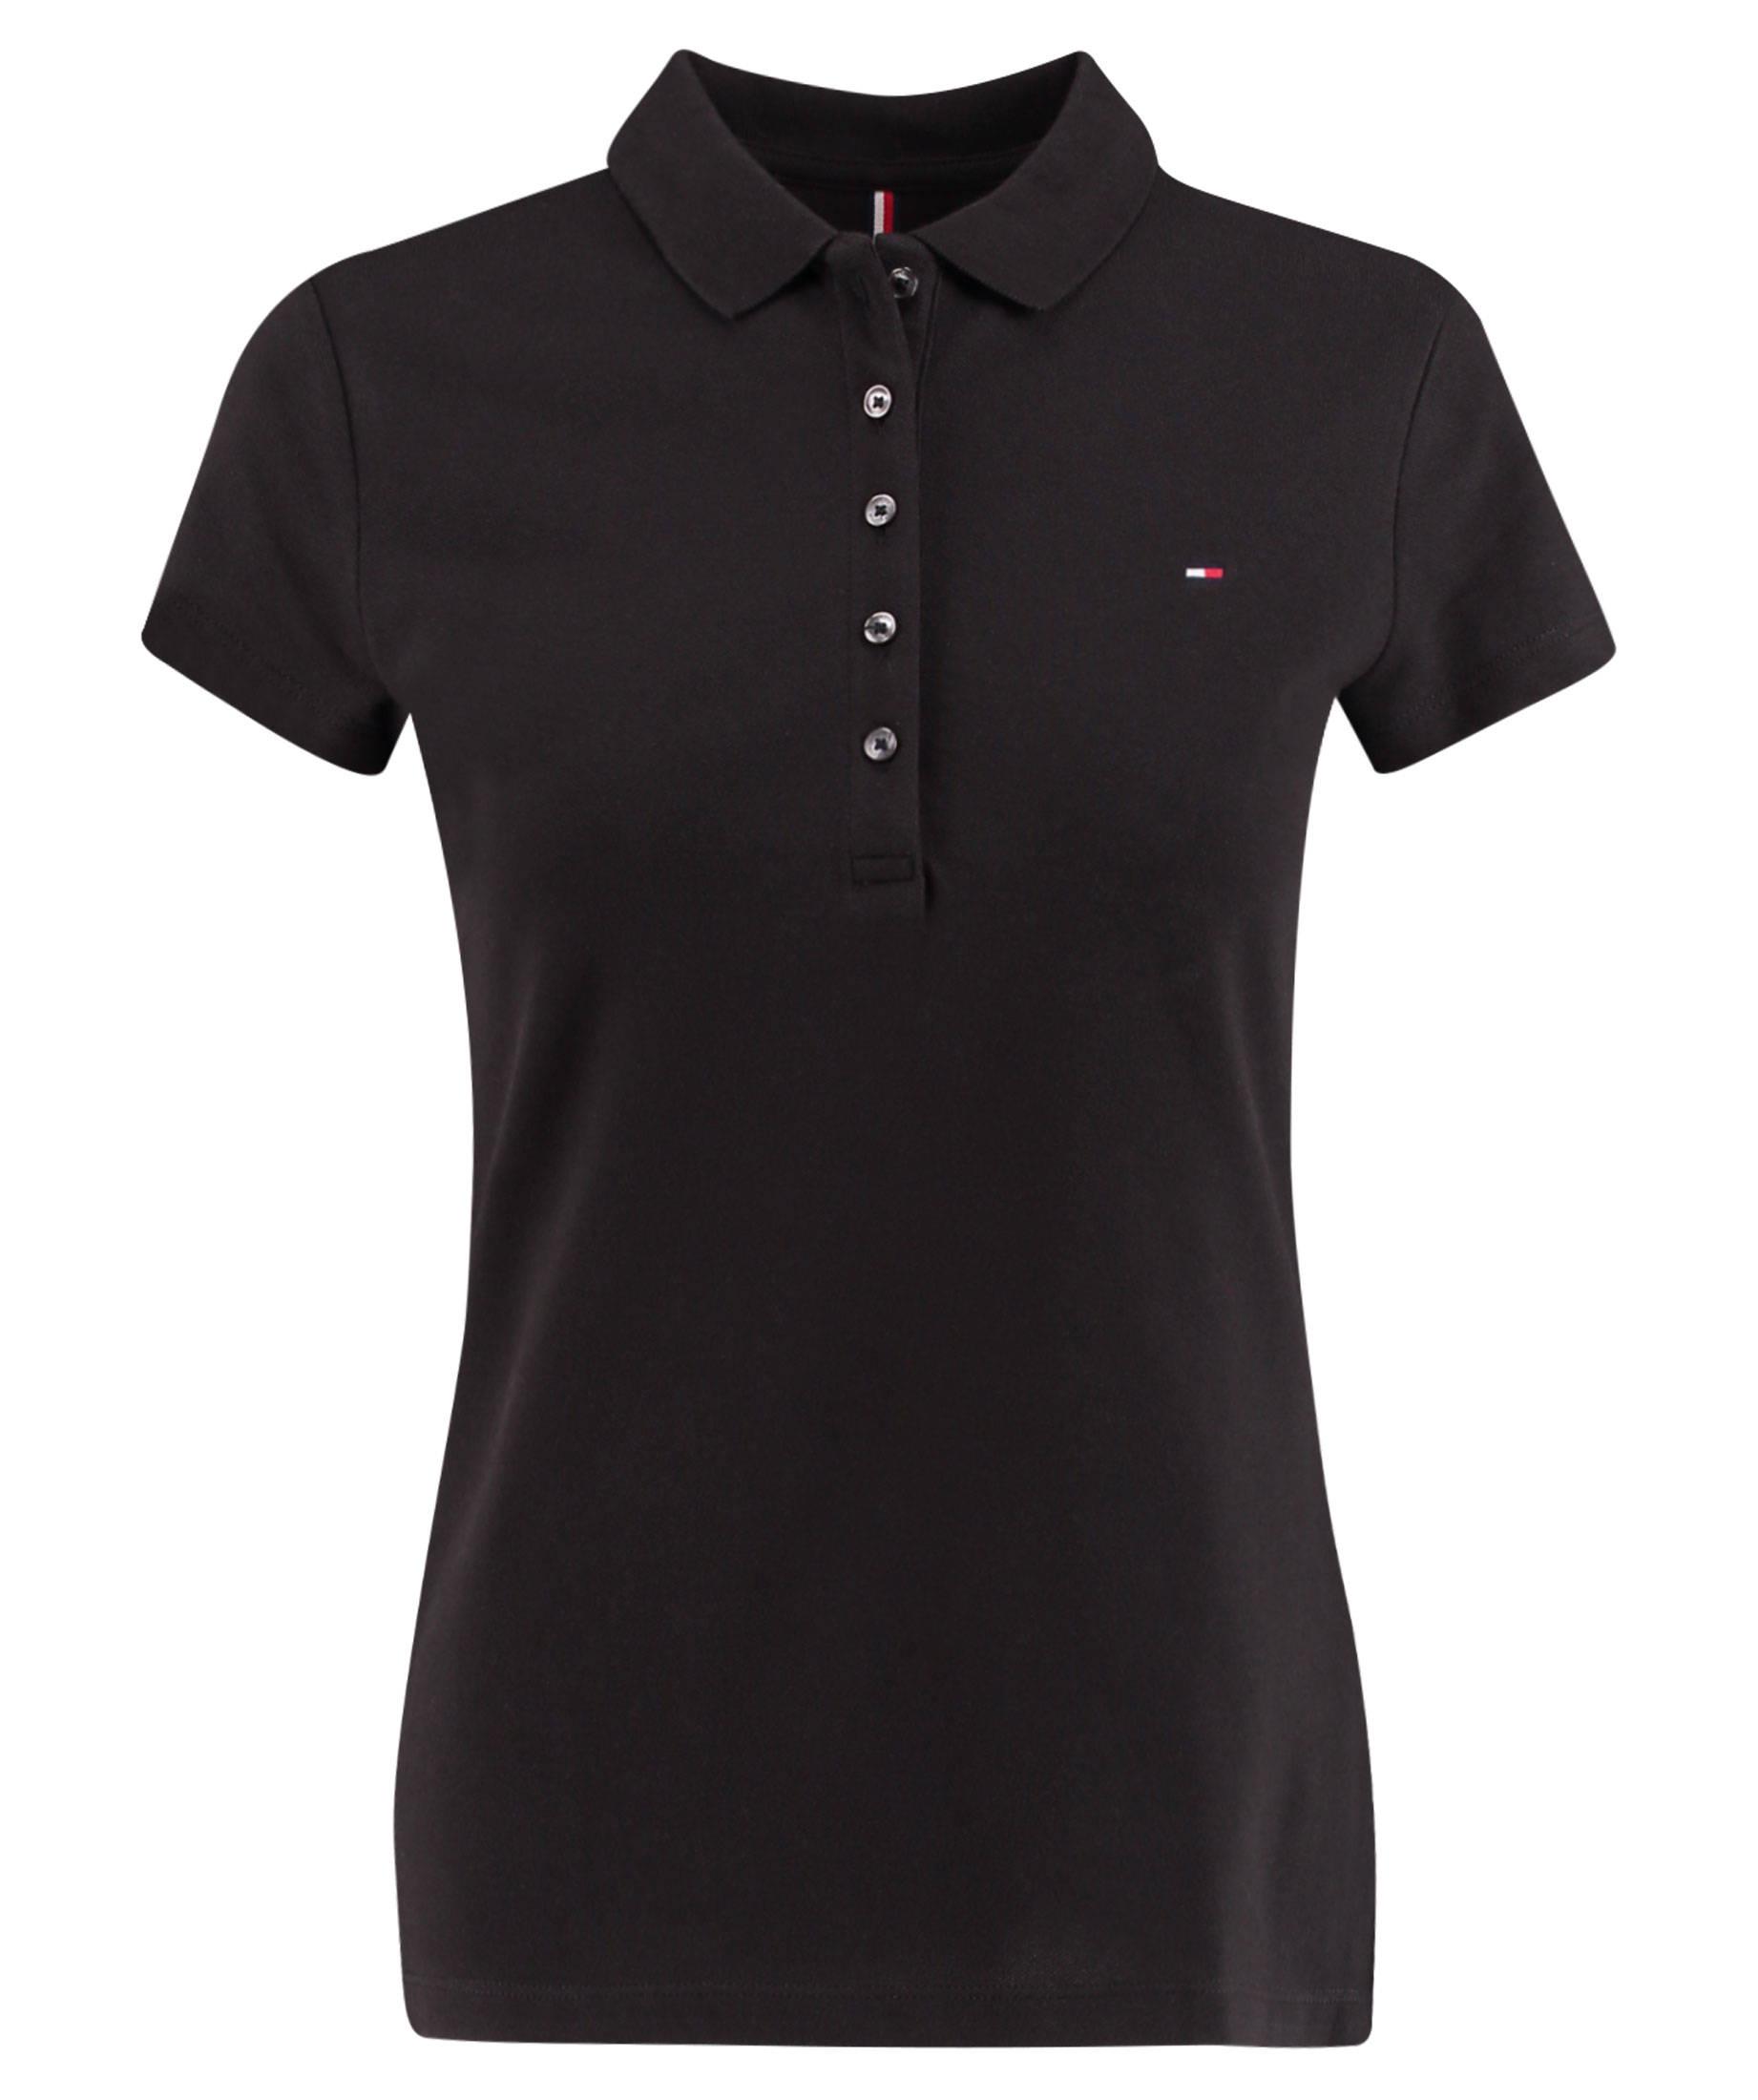 "Tommy Hilfiger Damen Poloshirt ""New Chiara"" Kurzarm"